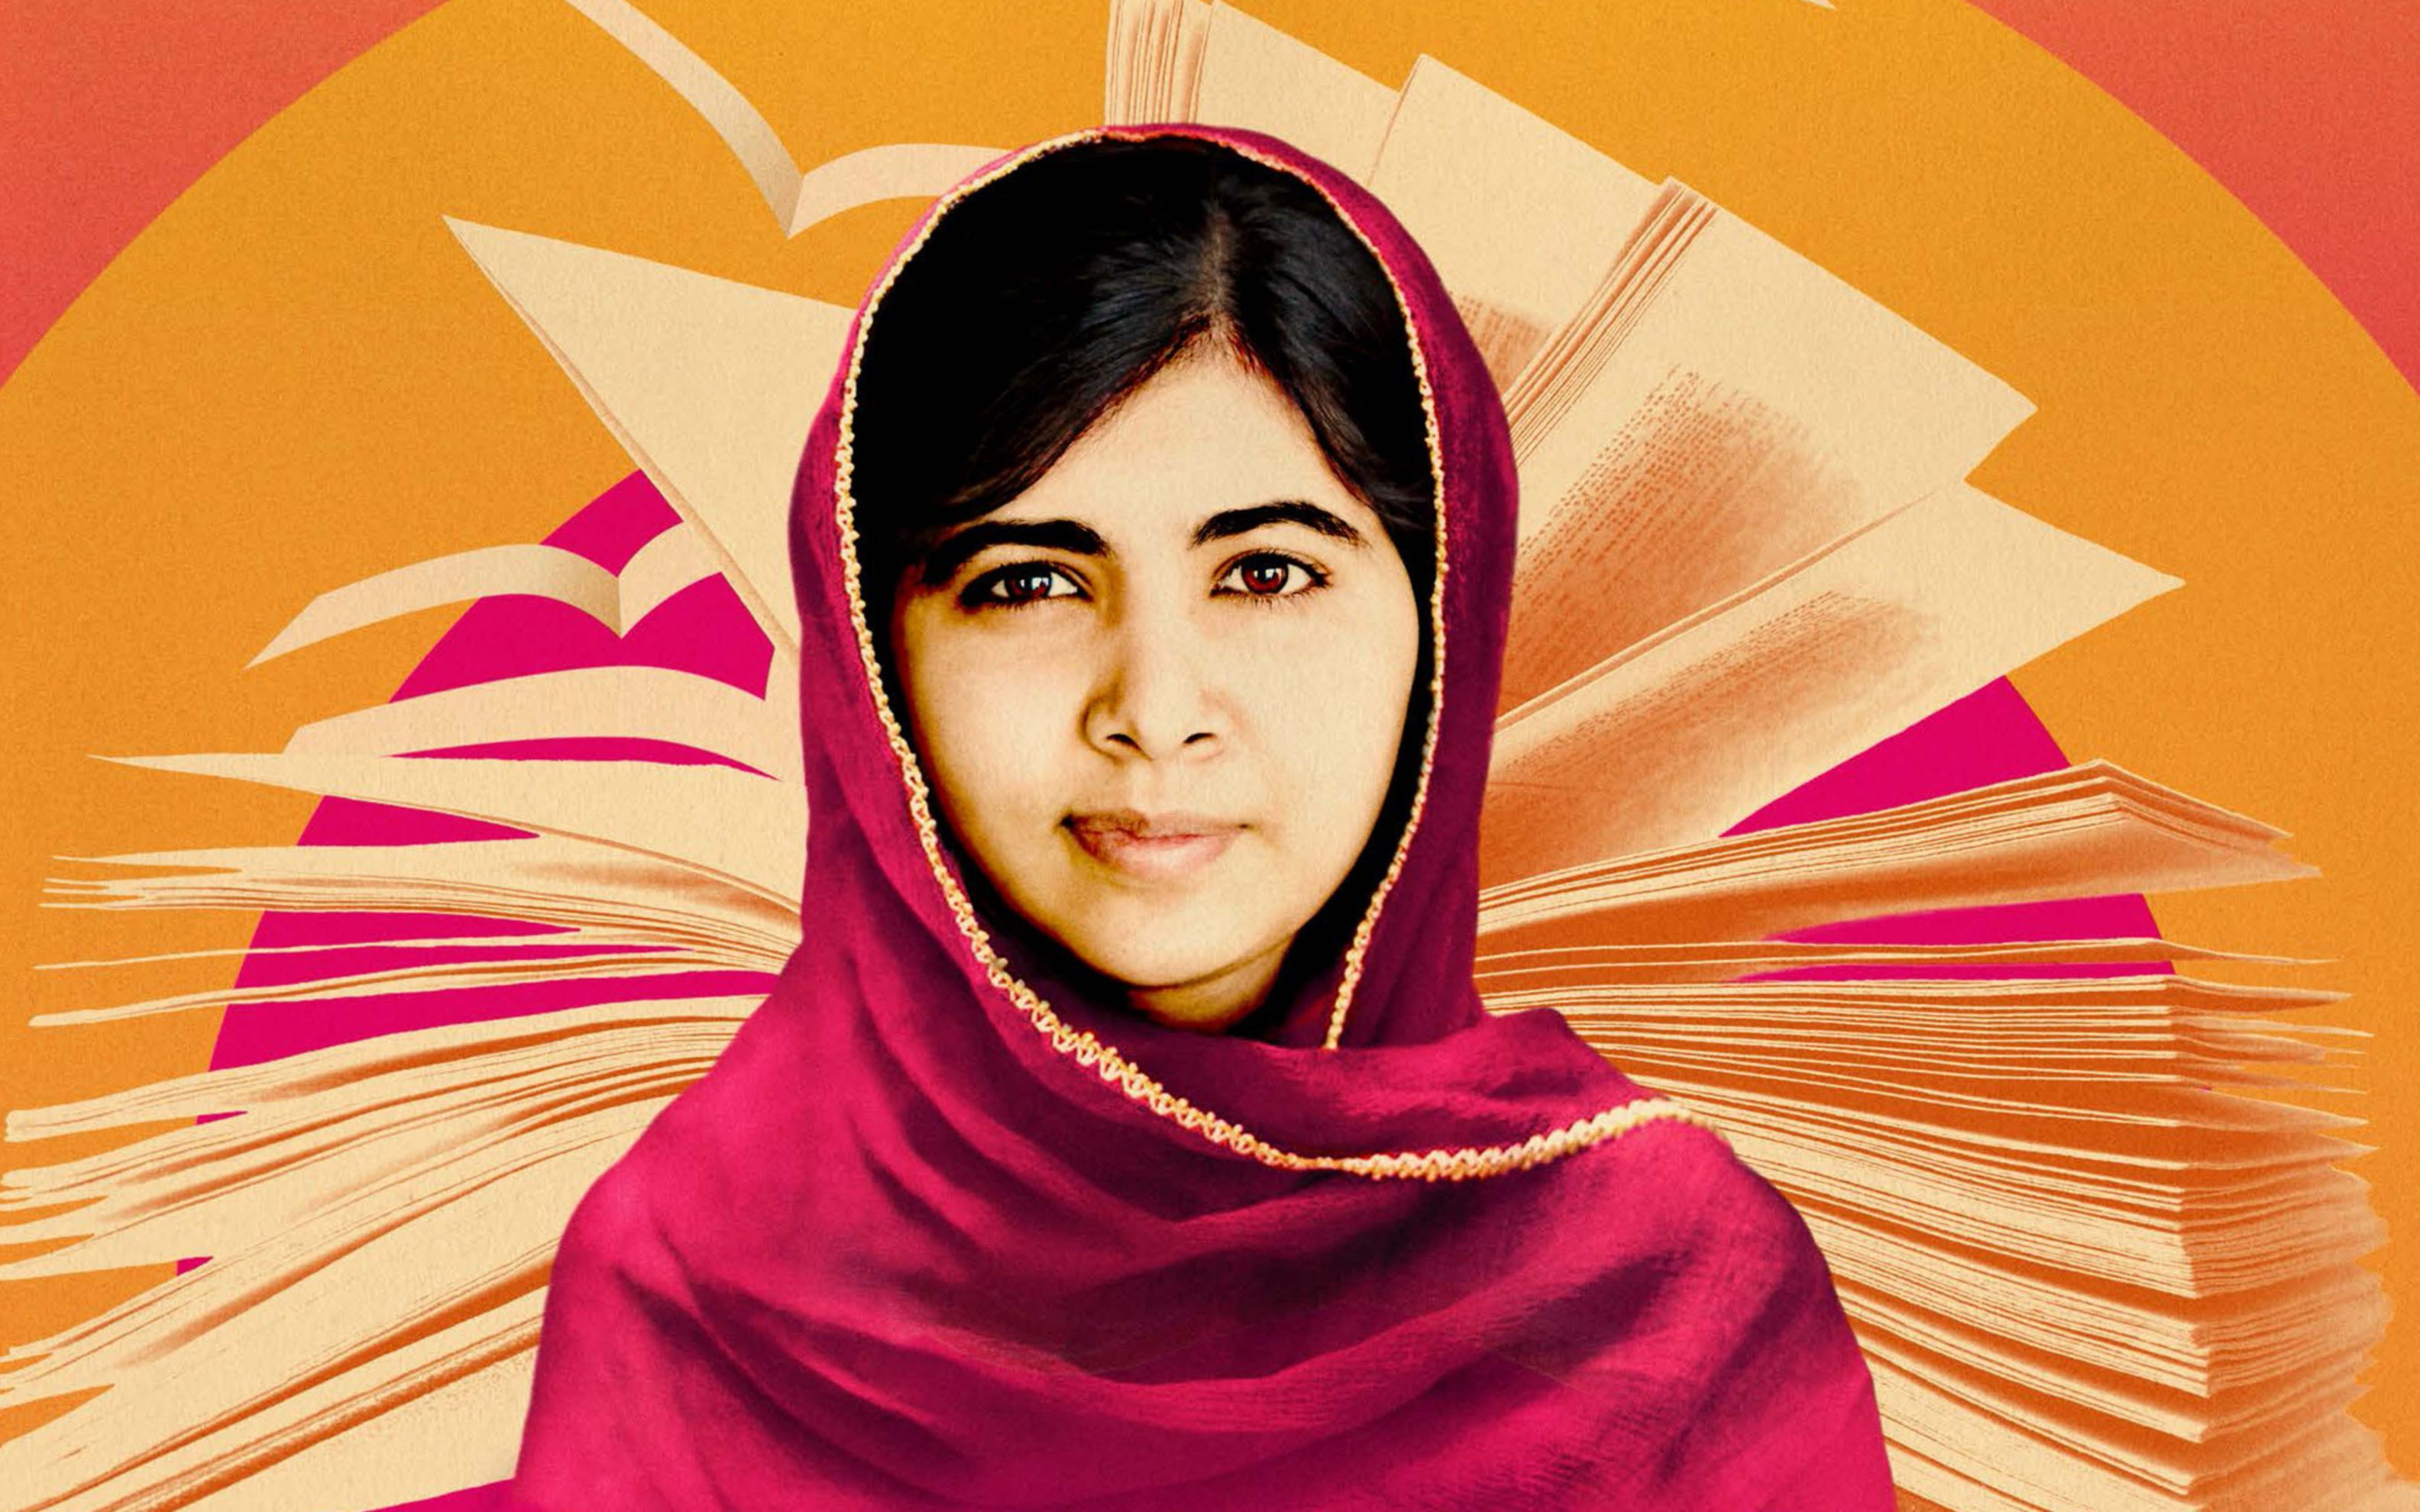 Malala Yousafzai Wide Wallpaper Desktop HD Wallpaper   Download 3168x1980